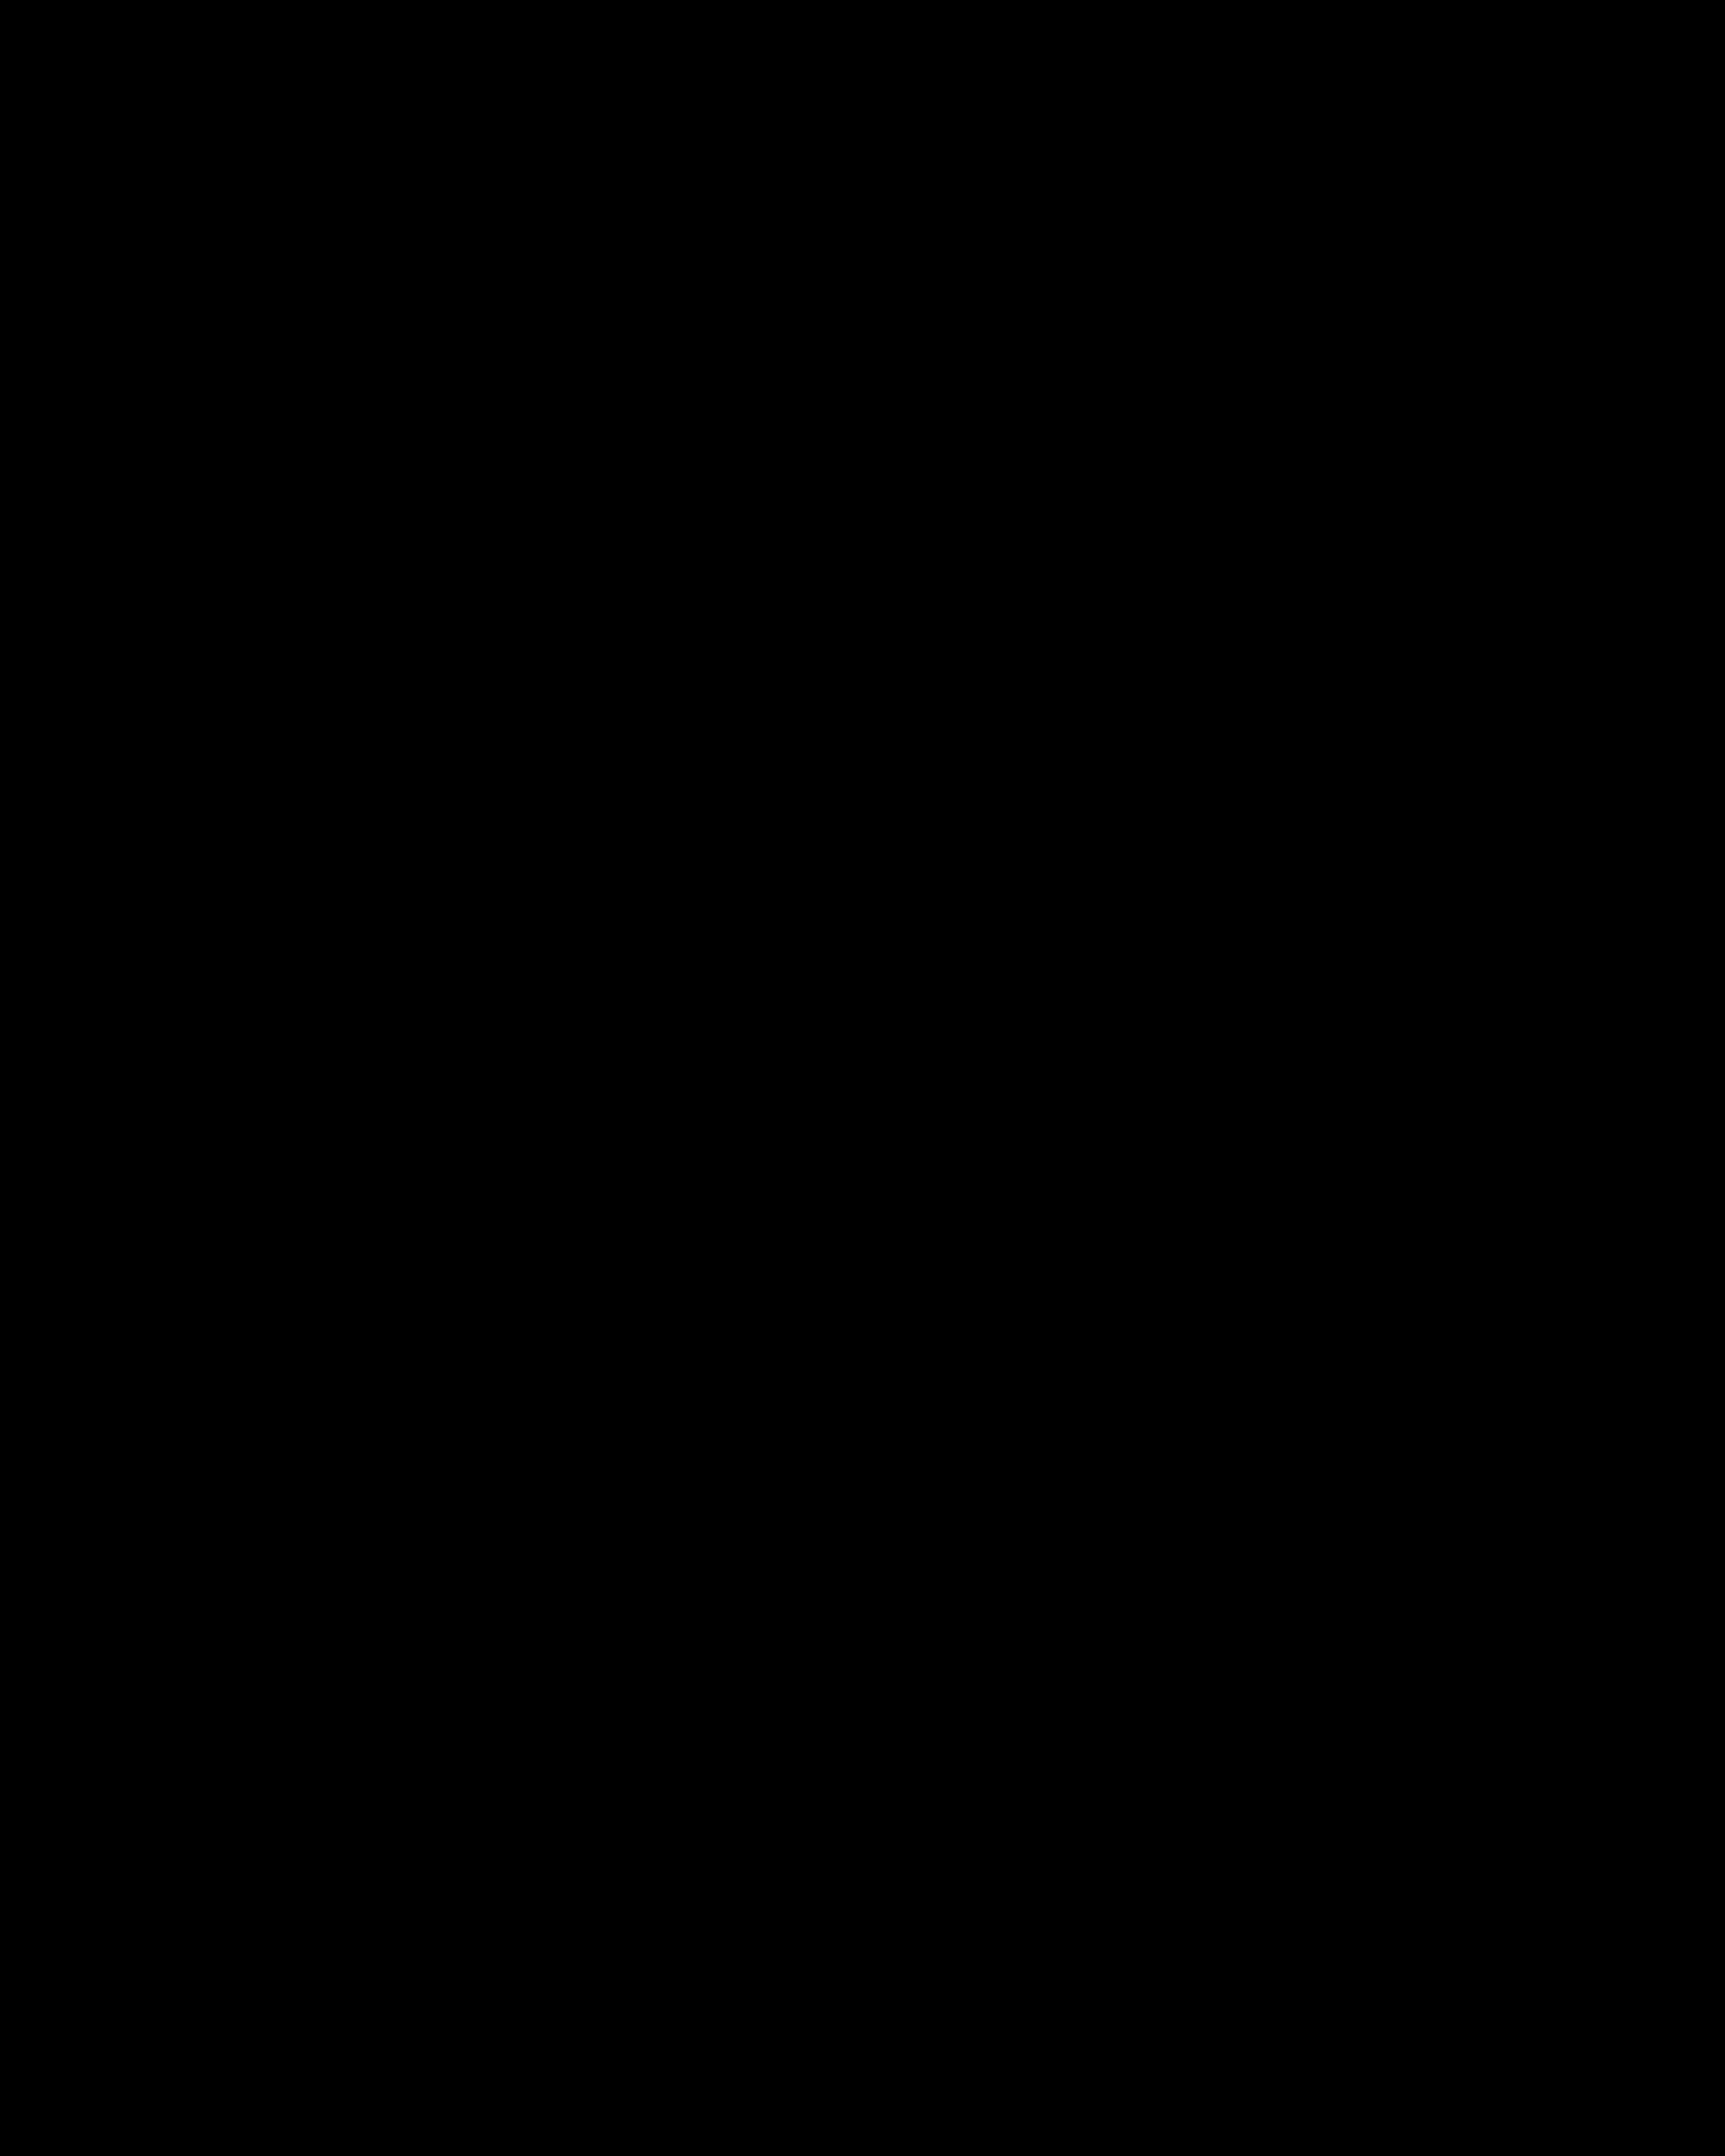 File:11 Parthenope symbol alternate.svg.